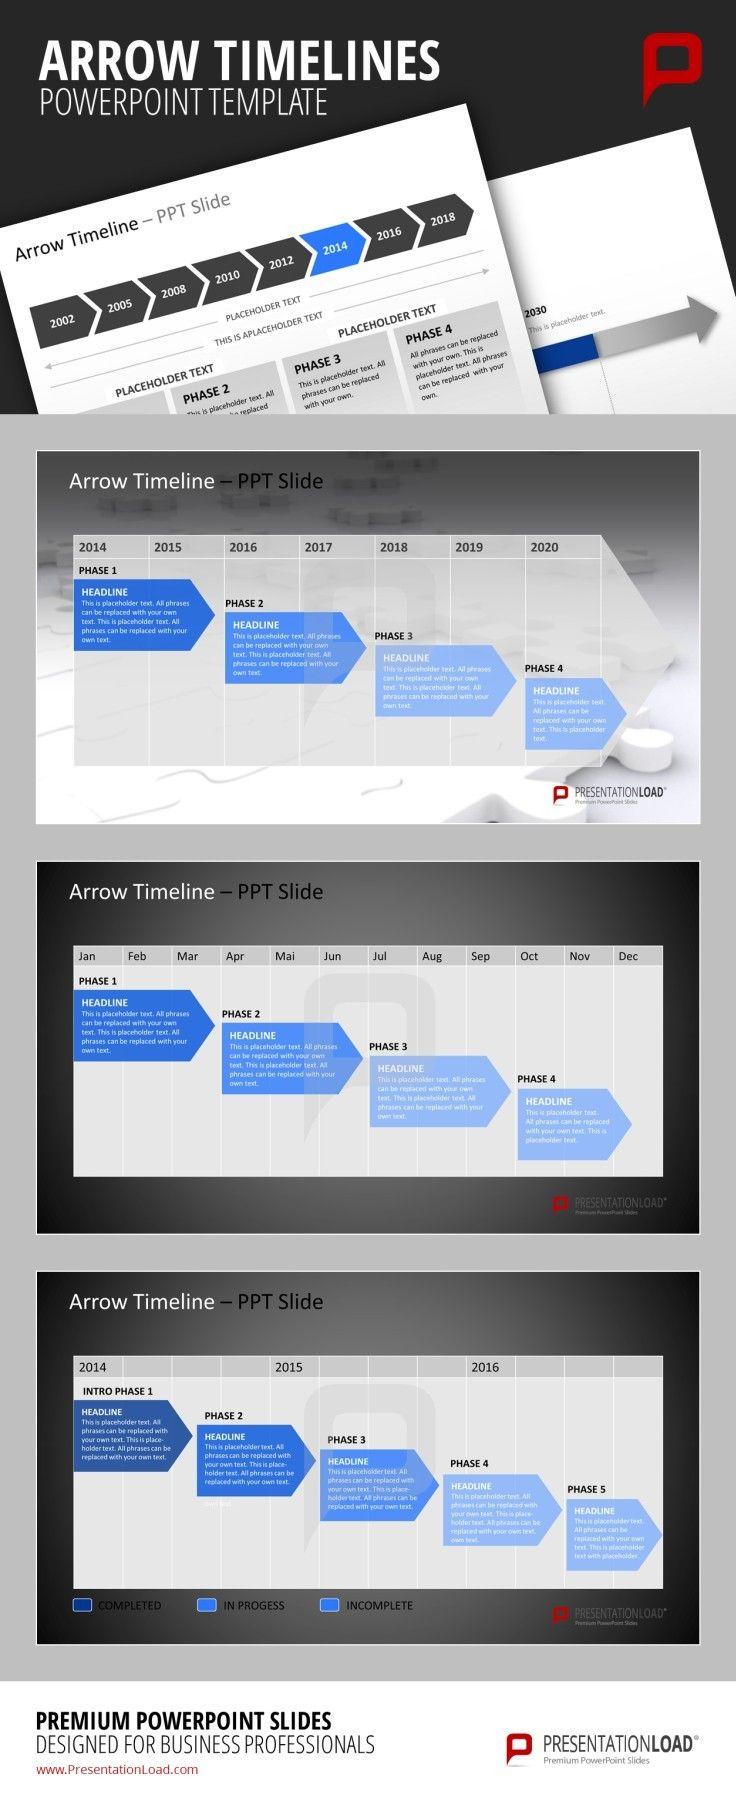 Powerpoint zeitstrahl als vorlage httppresentationload powerpoint timeline template for projects nvjuhfo Gallery